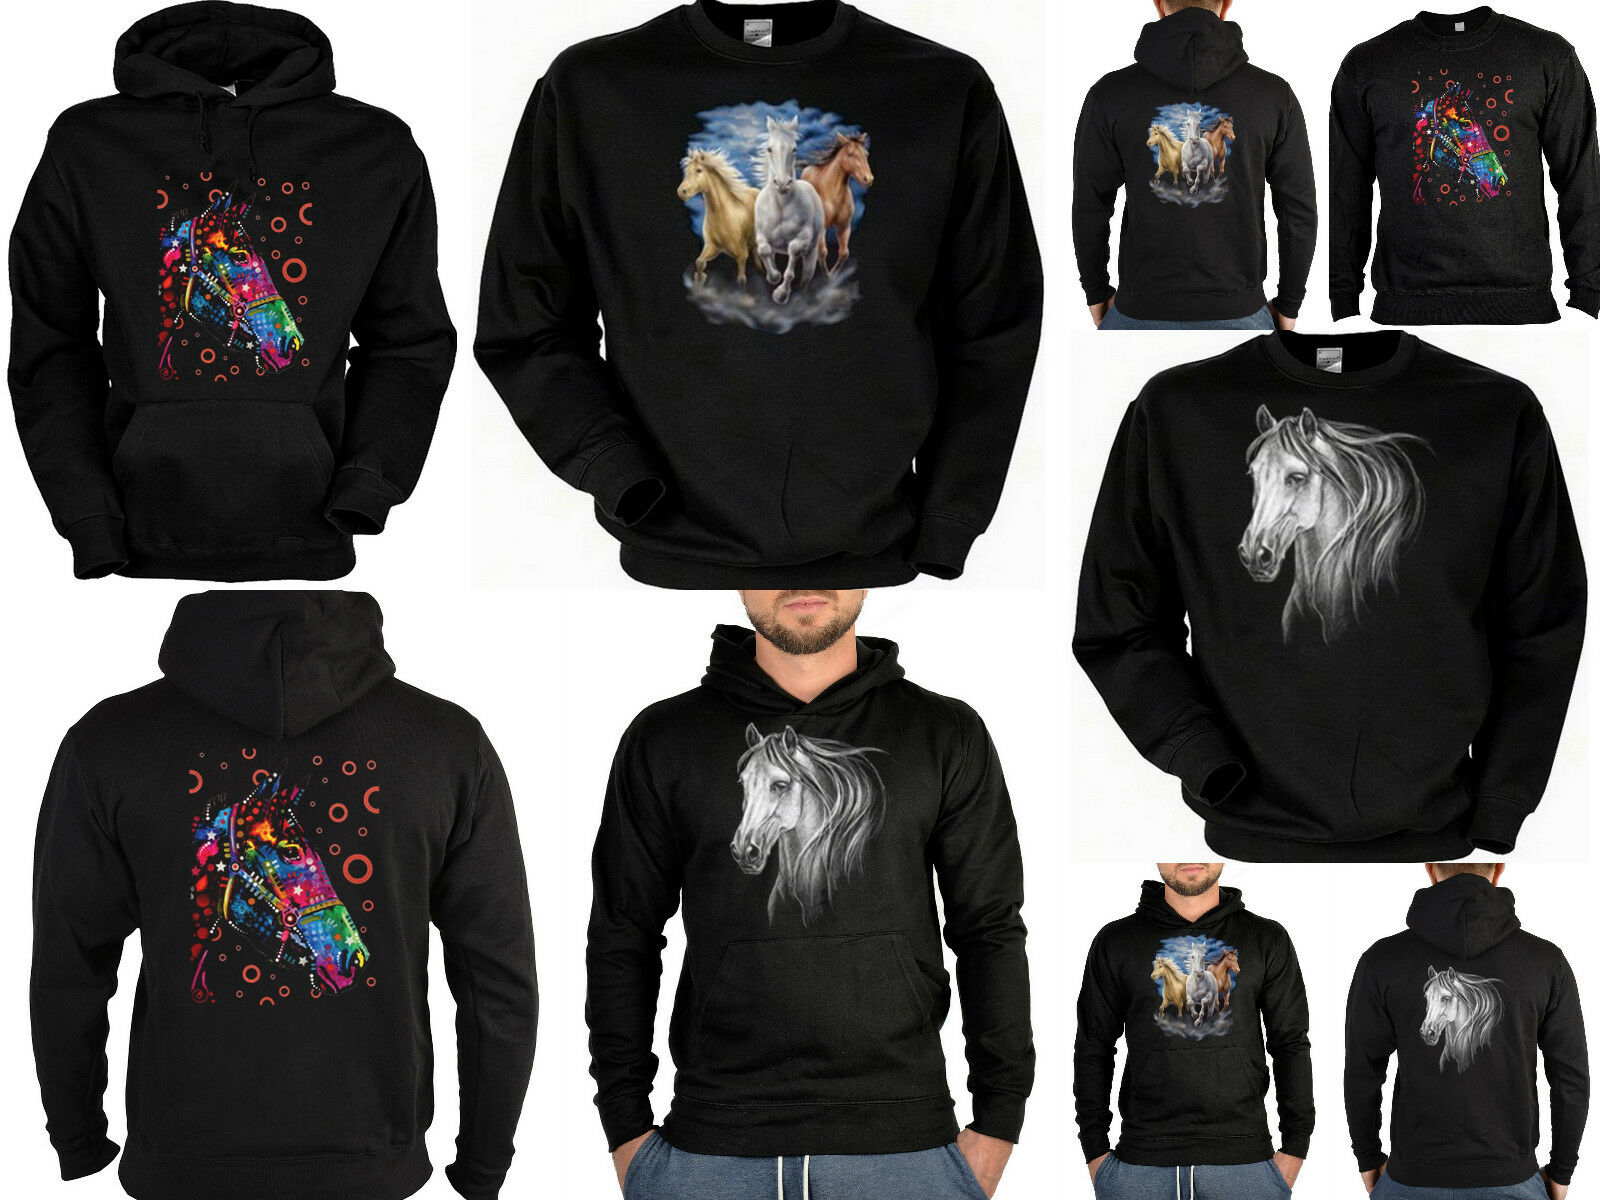 Pferde Sweater - Kapuzensweater - Zip Hoodie Neon Pferd Motiv Pferdemotiv Pulli